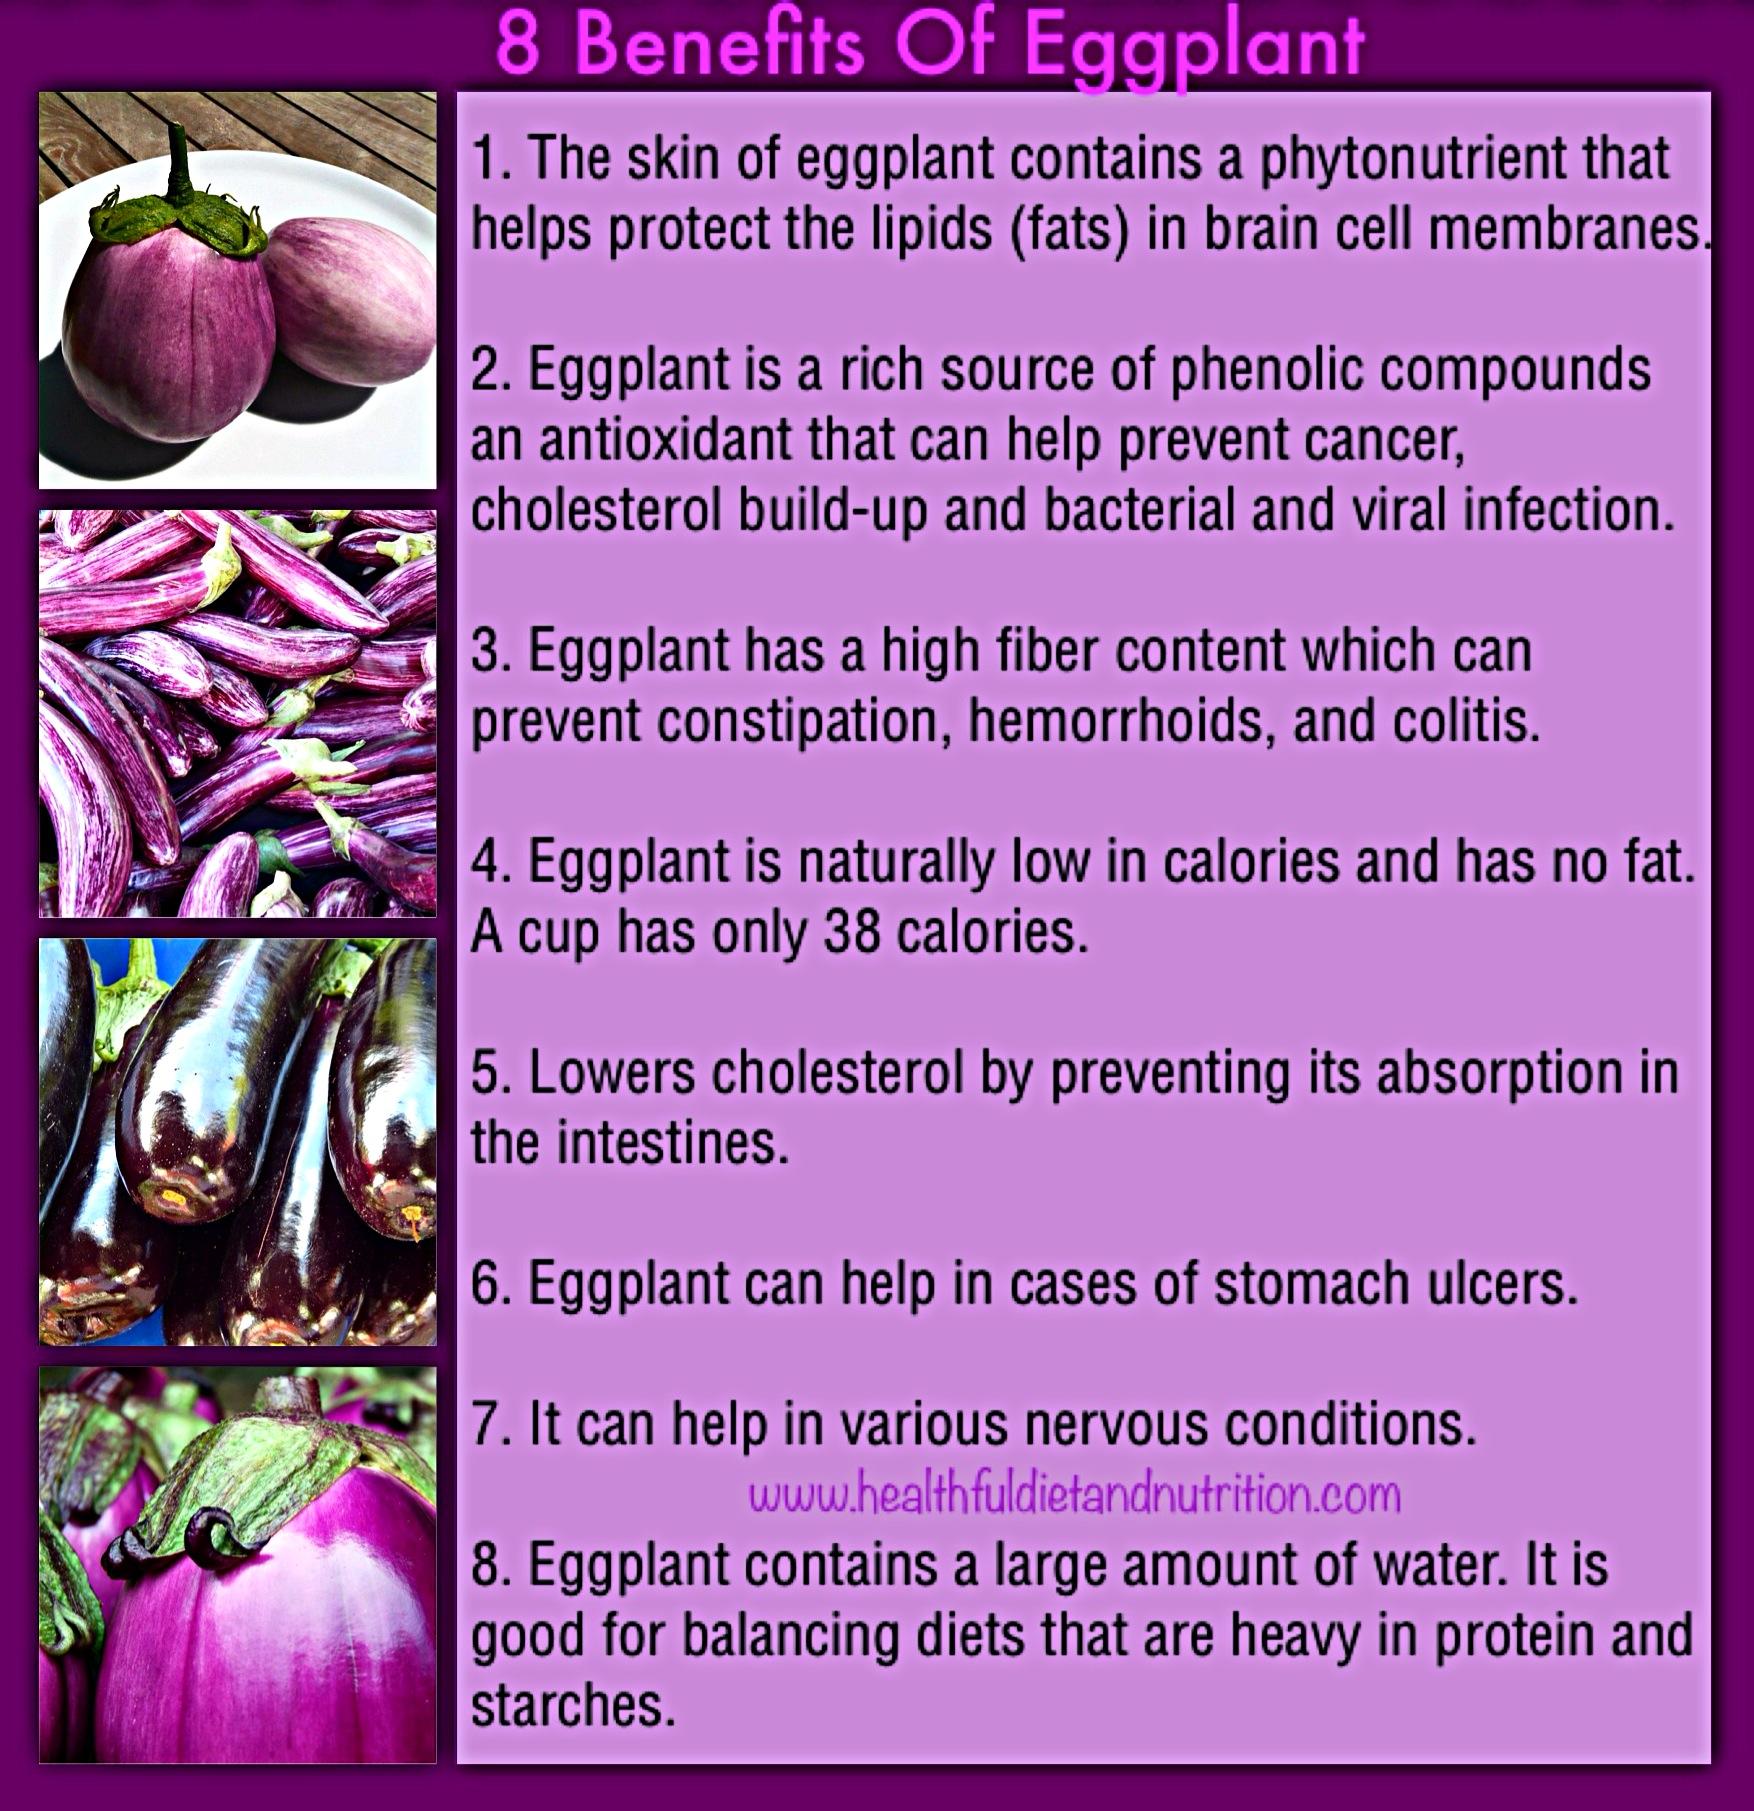 8 Benefits of Eggplant